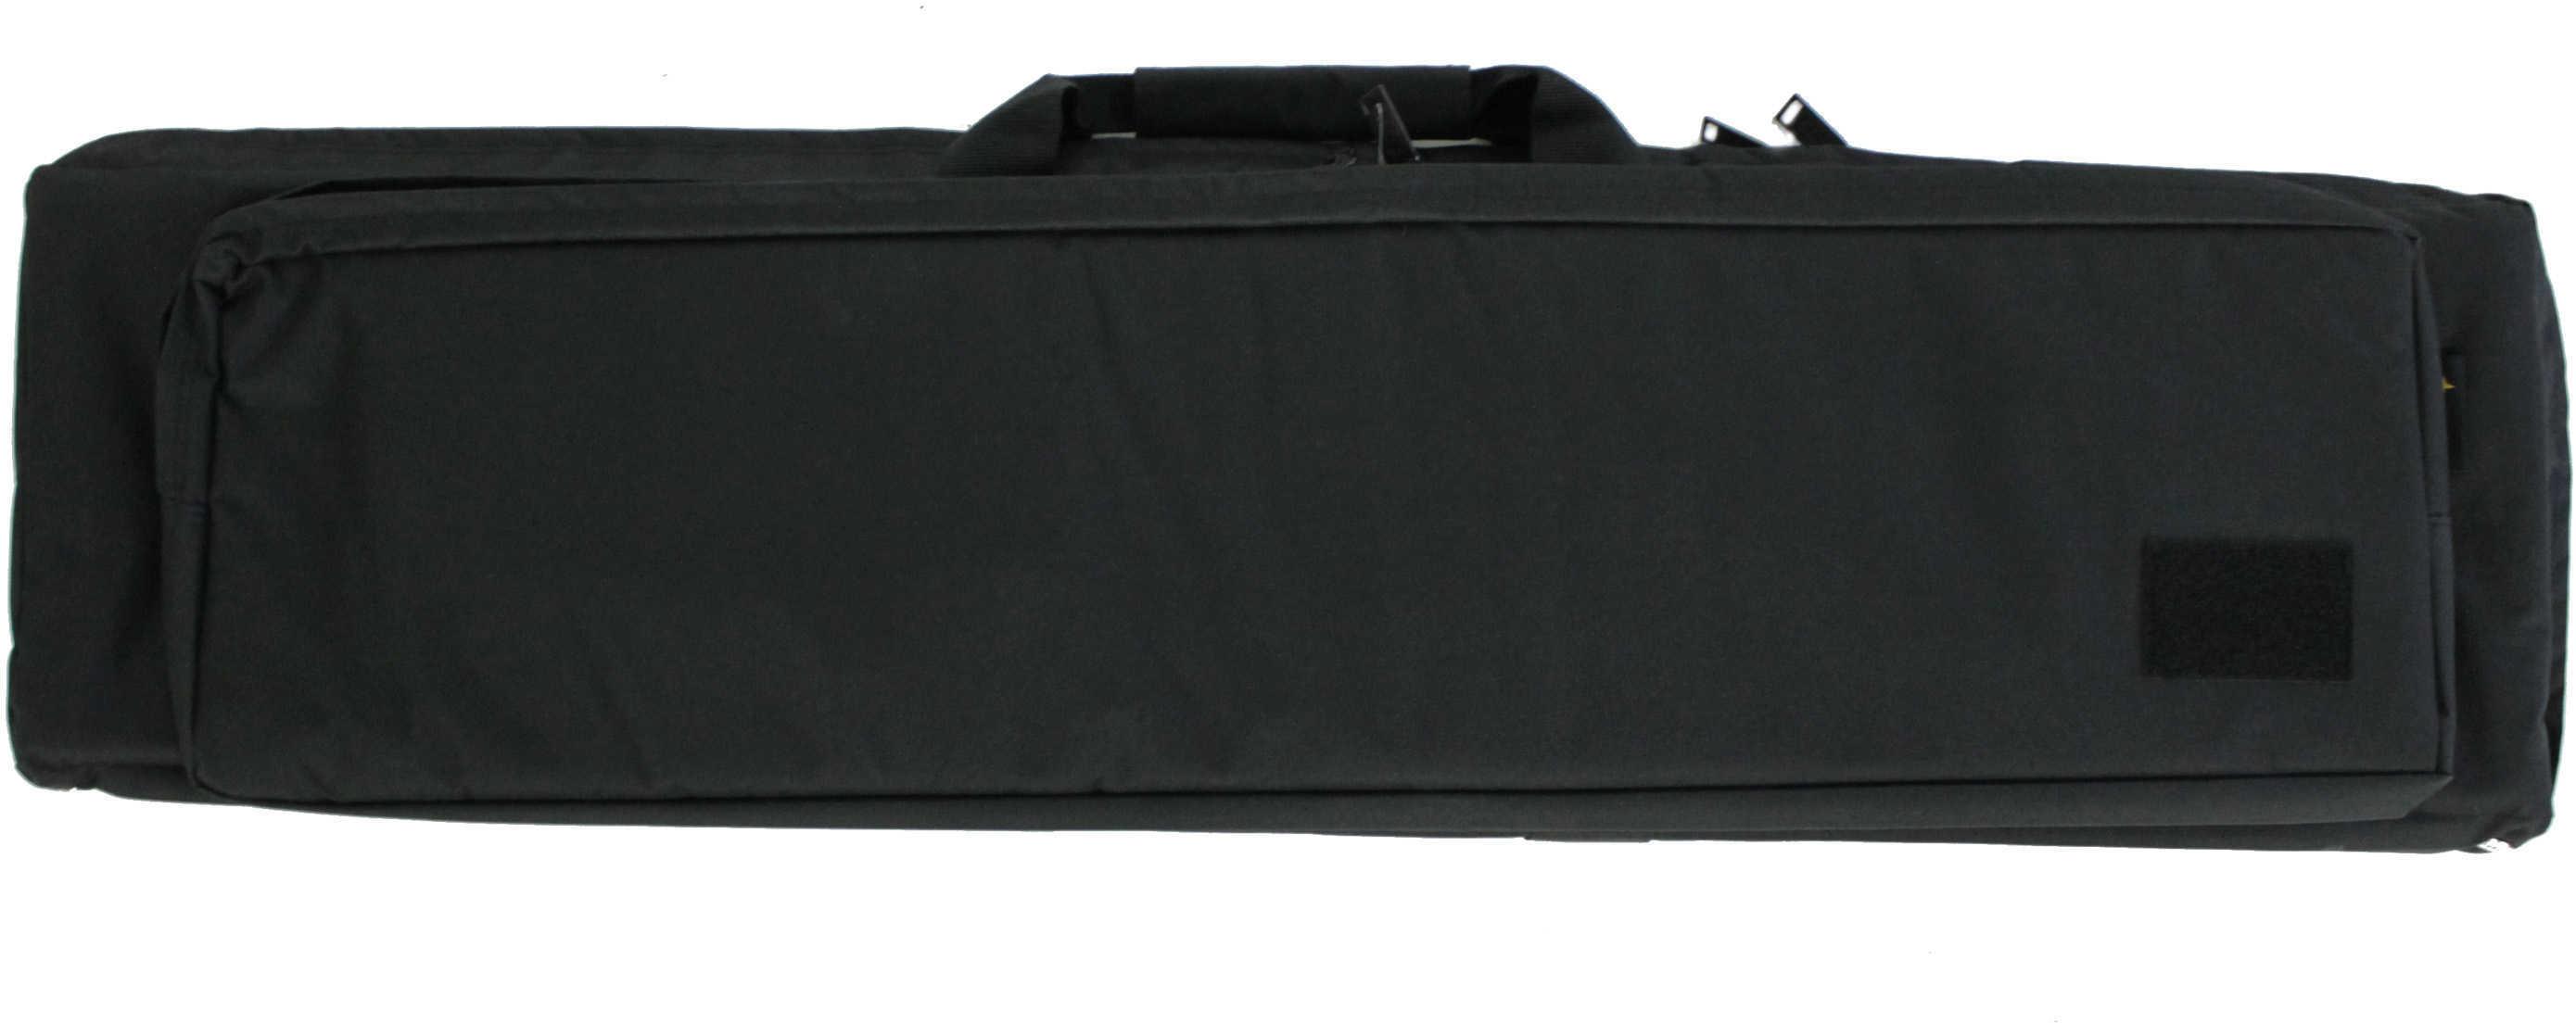 "US PeaceKeeper Rat Rapid Assault Tactical Case Black Soft 42"" P30042"